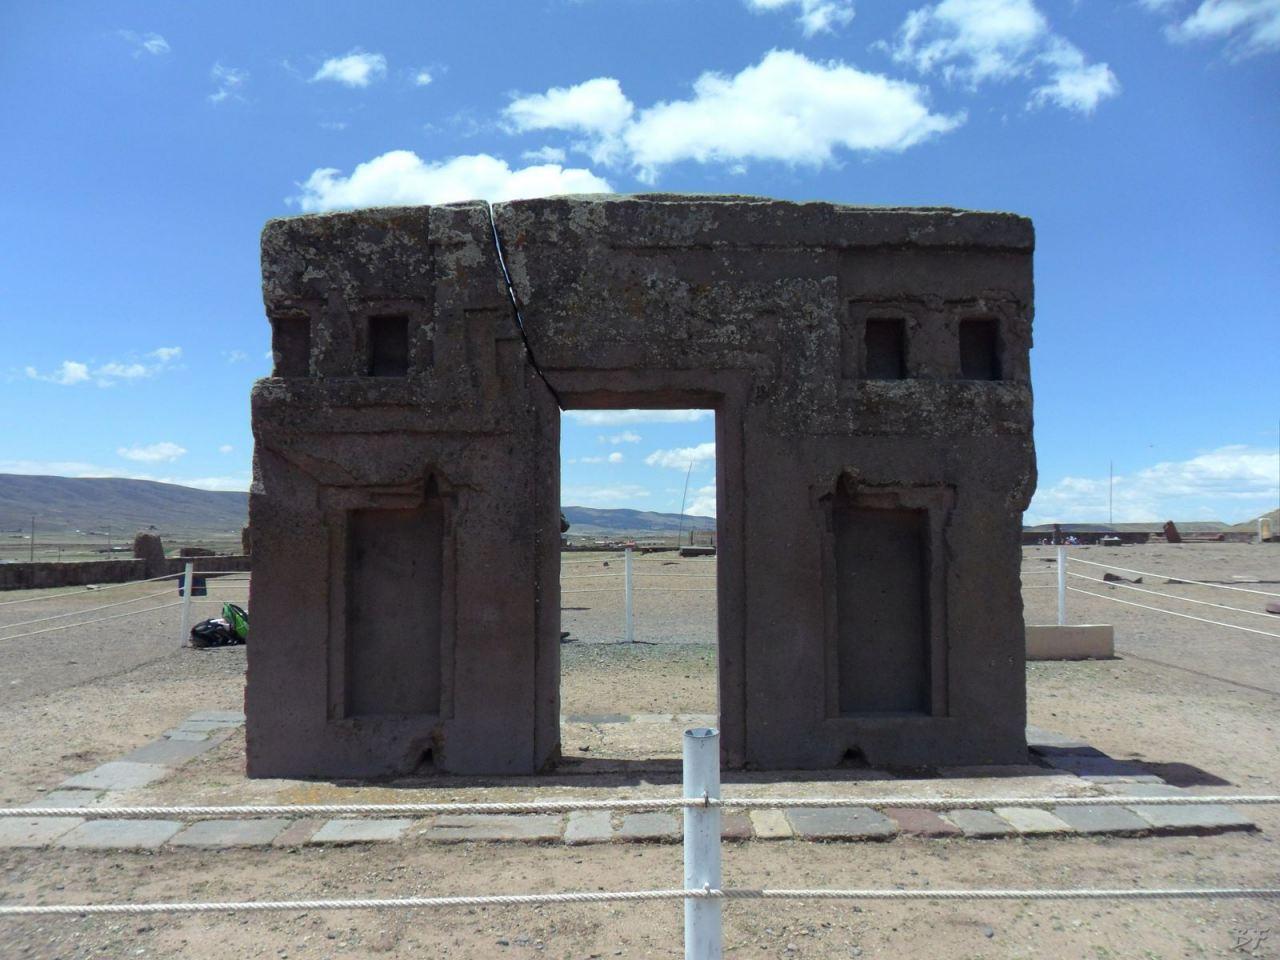 Sito-Megalitico-Piramide-Akapana-Kalasasaya-Menhir-Tiahuanaco-Bolivia-20